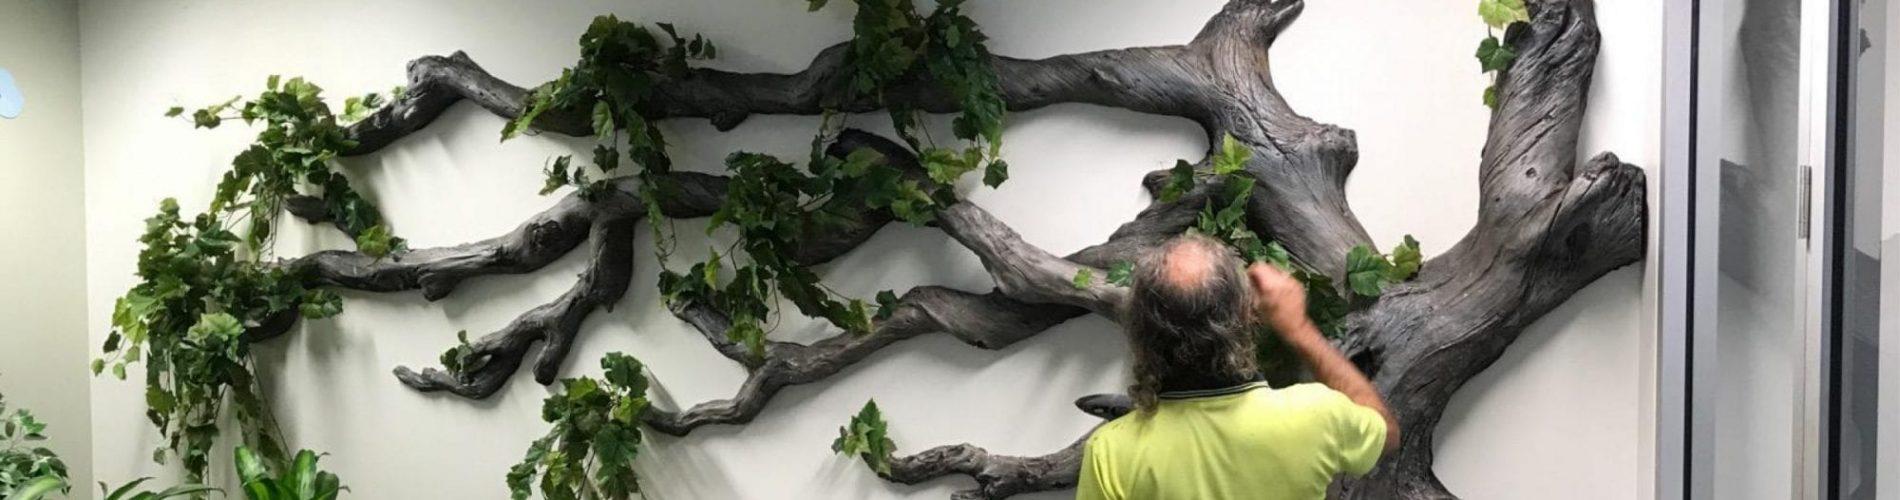 Repairing a fibreglass sculpture